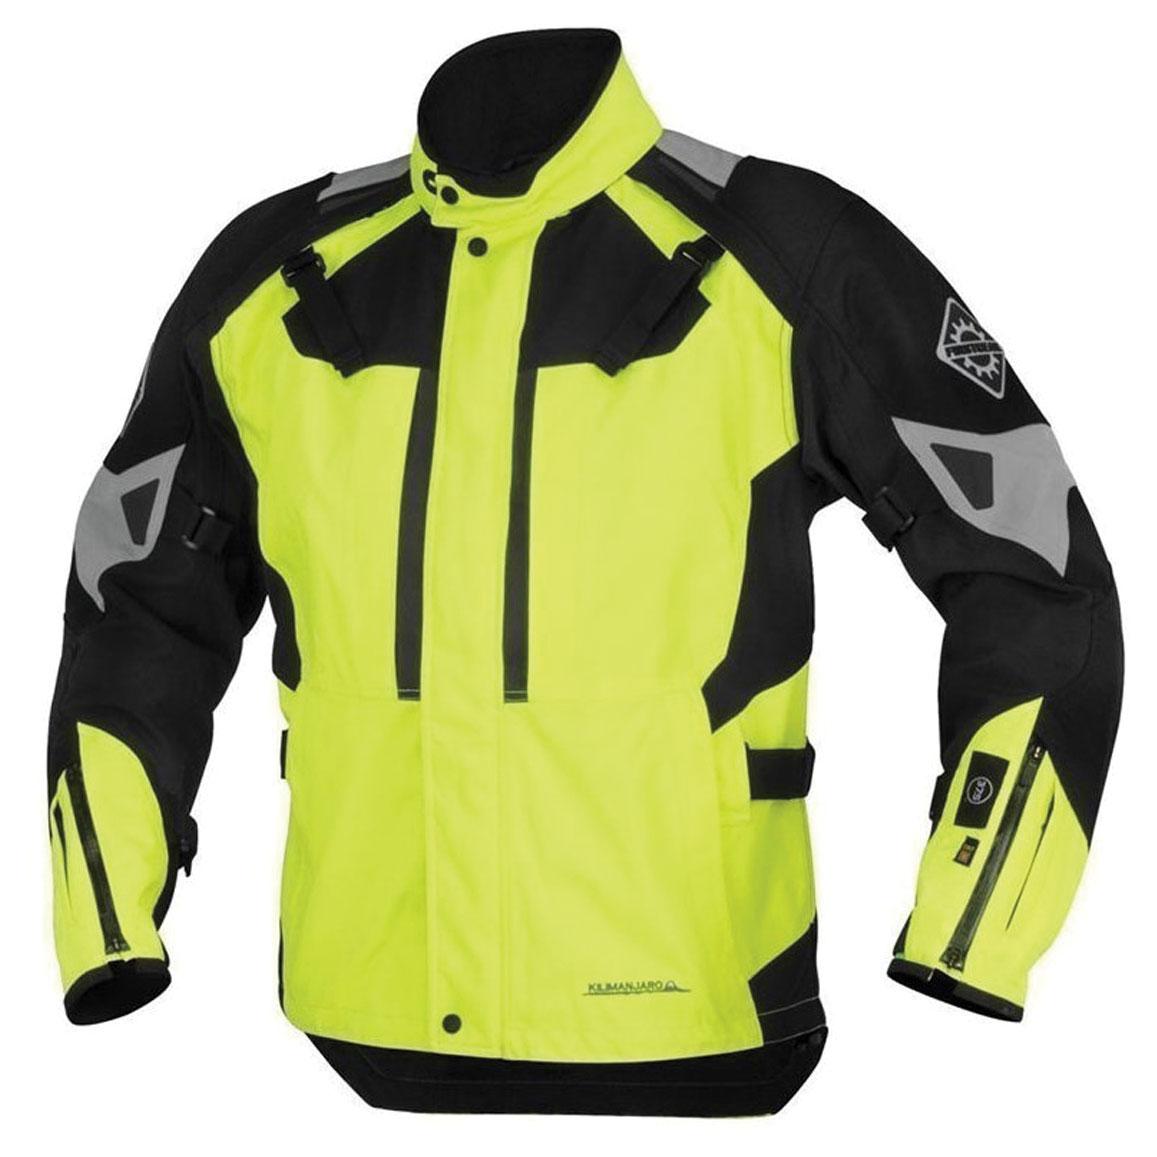 Firstgear 37.5 Men's Kilimanjaro DayGlo/Black Jacket